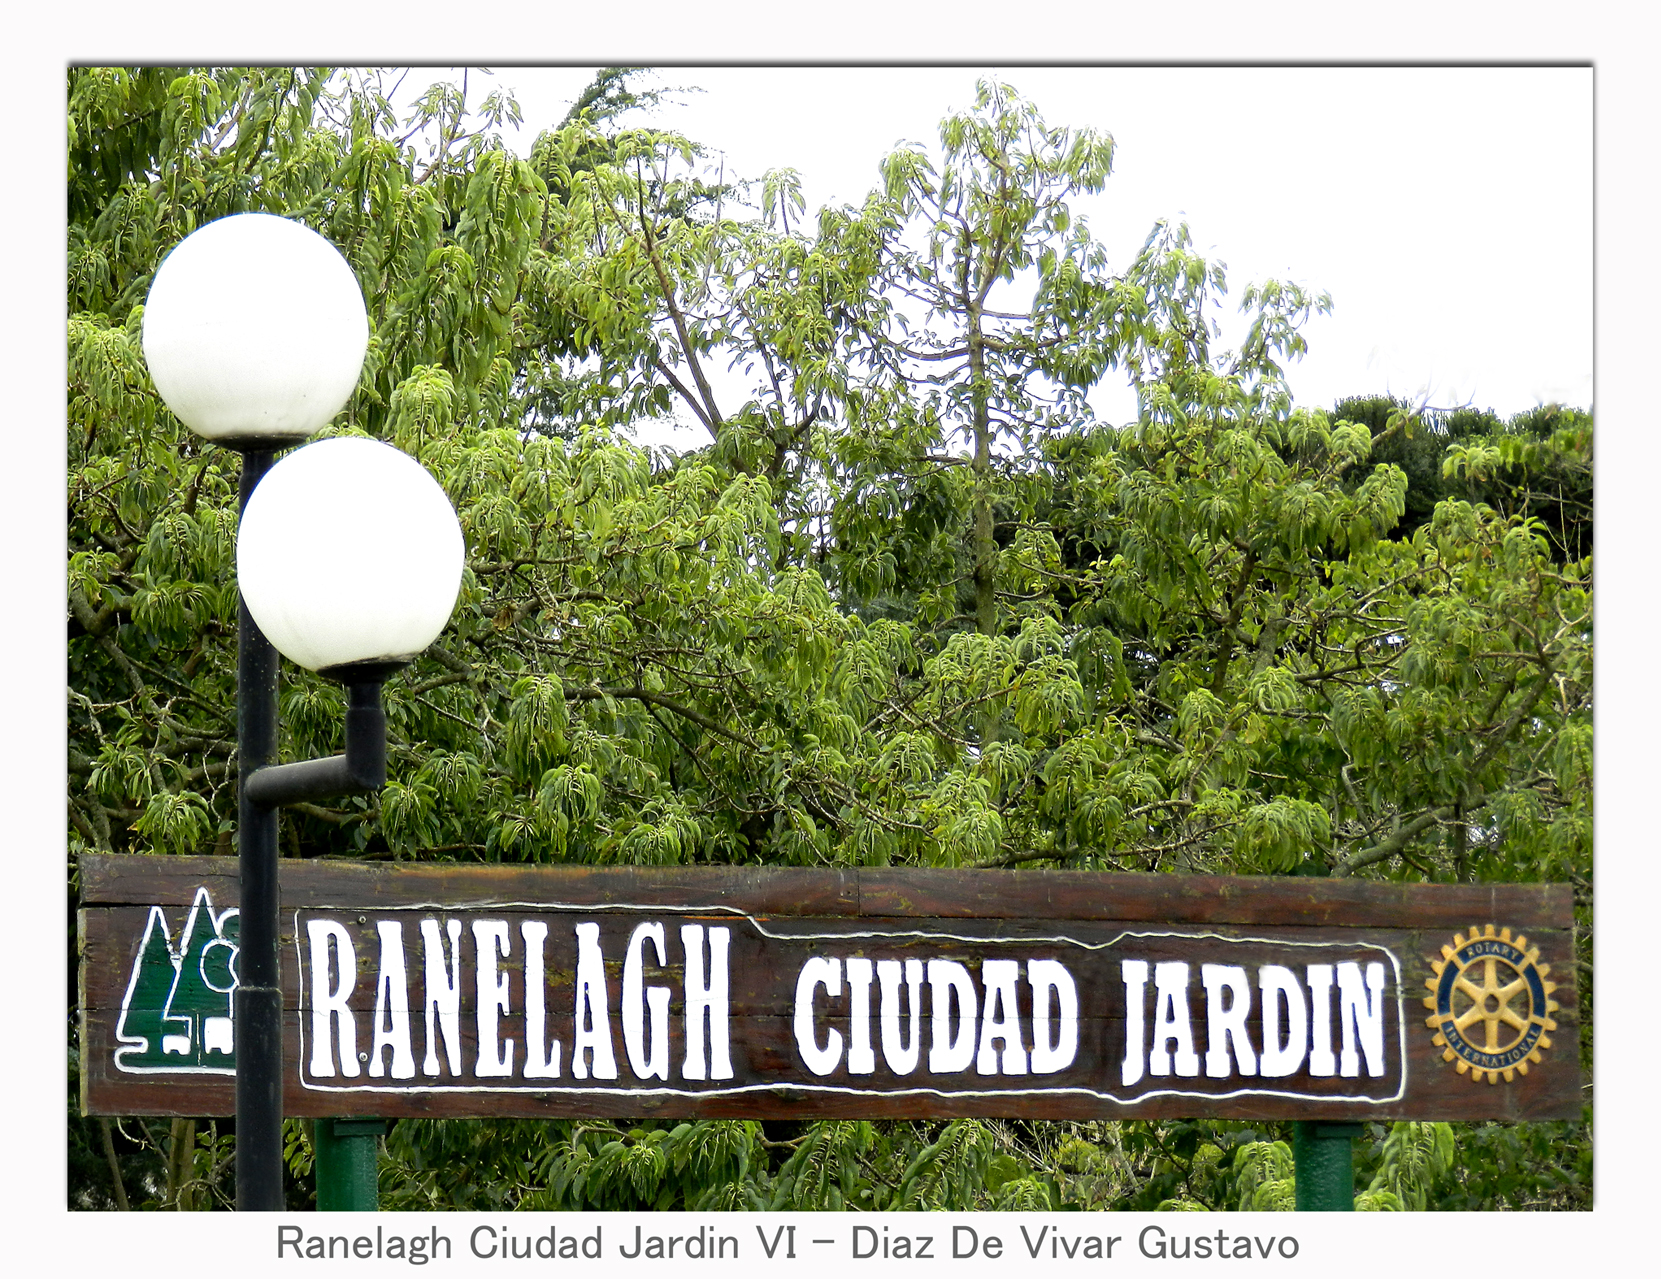 Ranelagh Ciudad Jardin VI Diaz De Vivar Gustavo